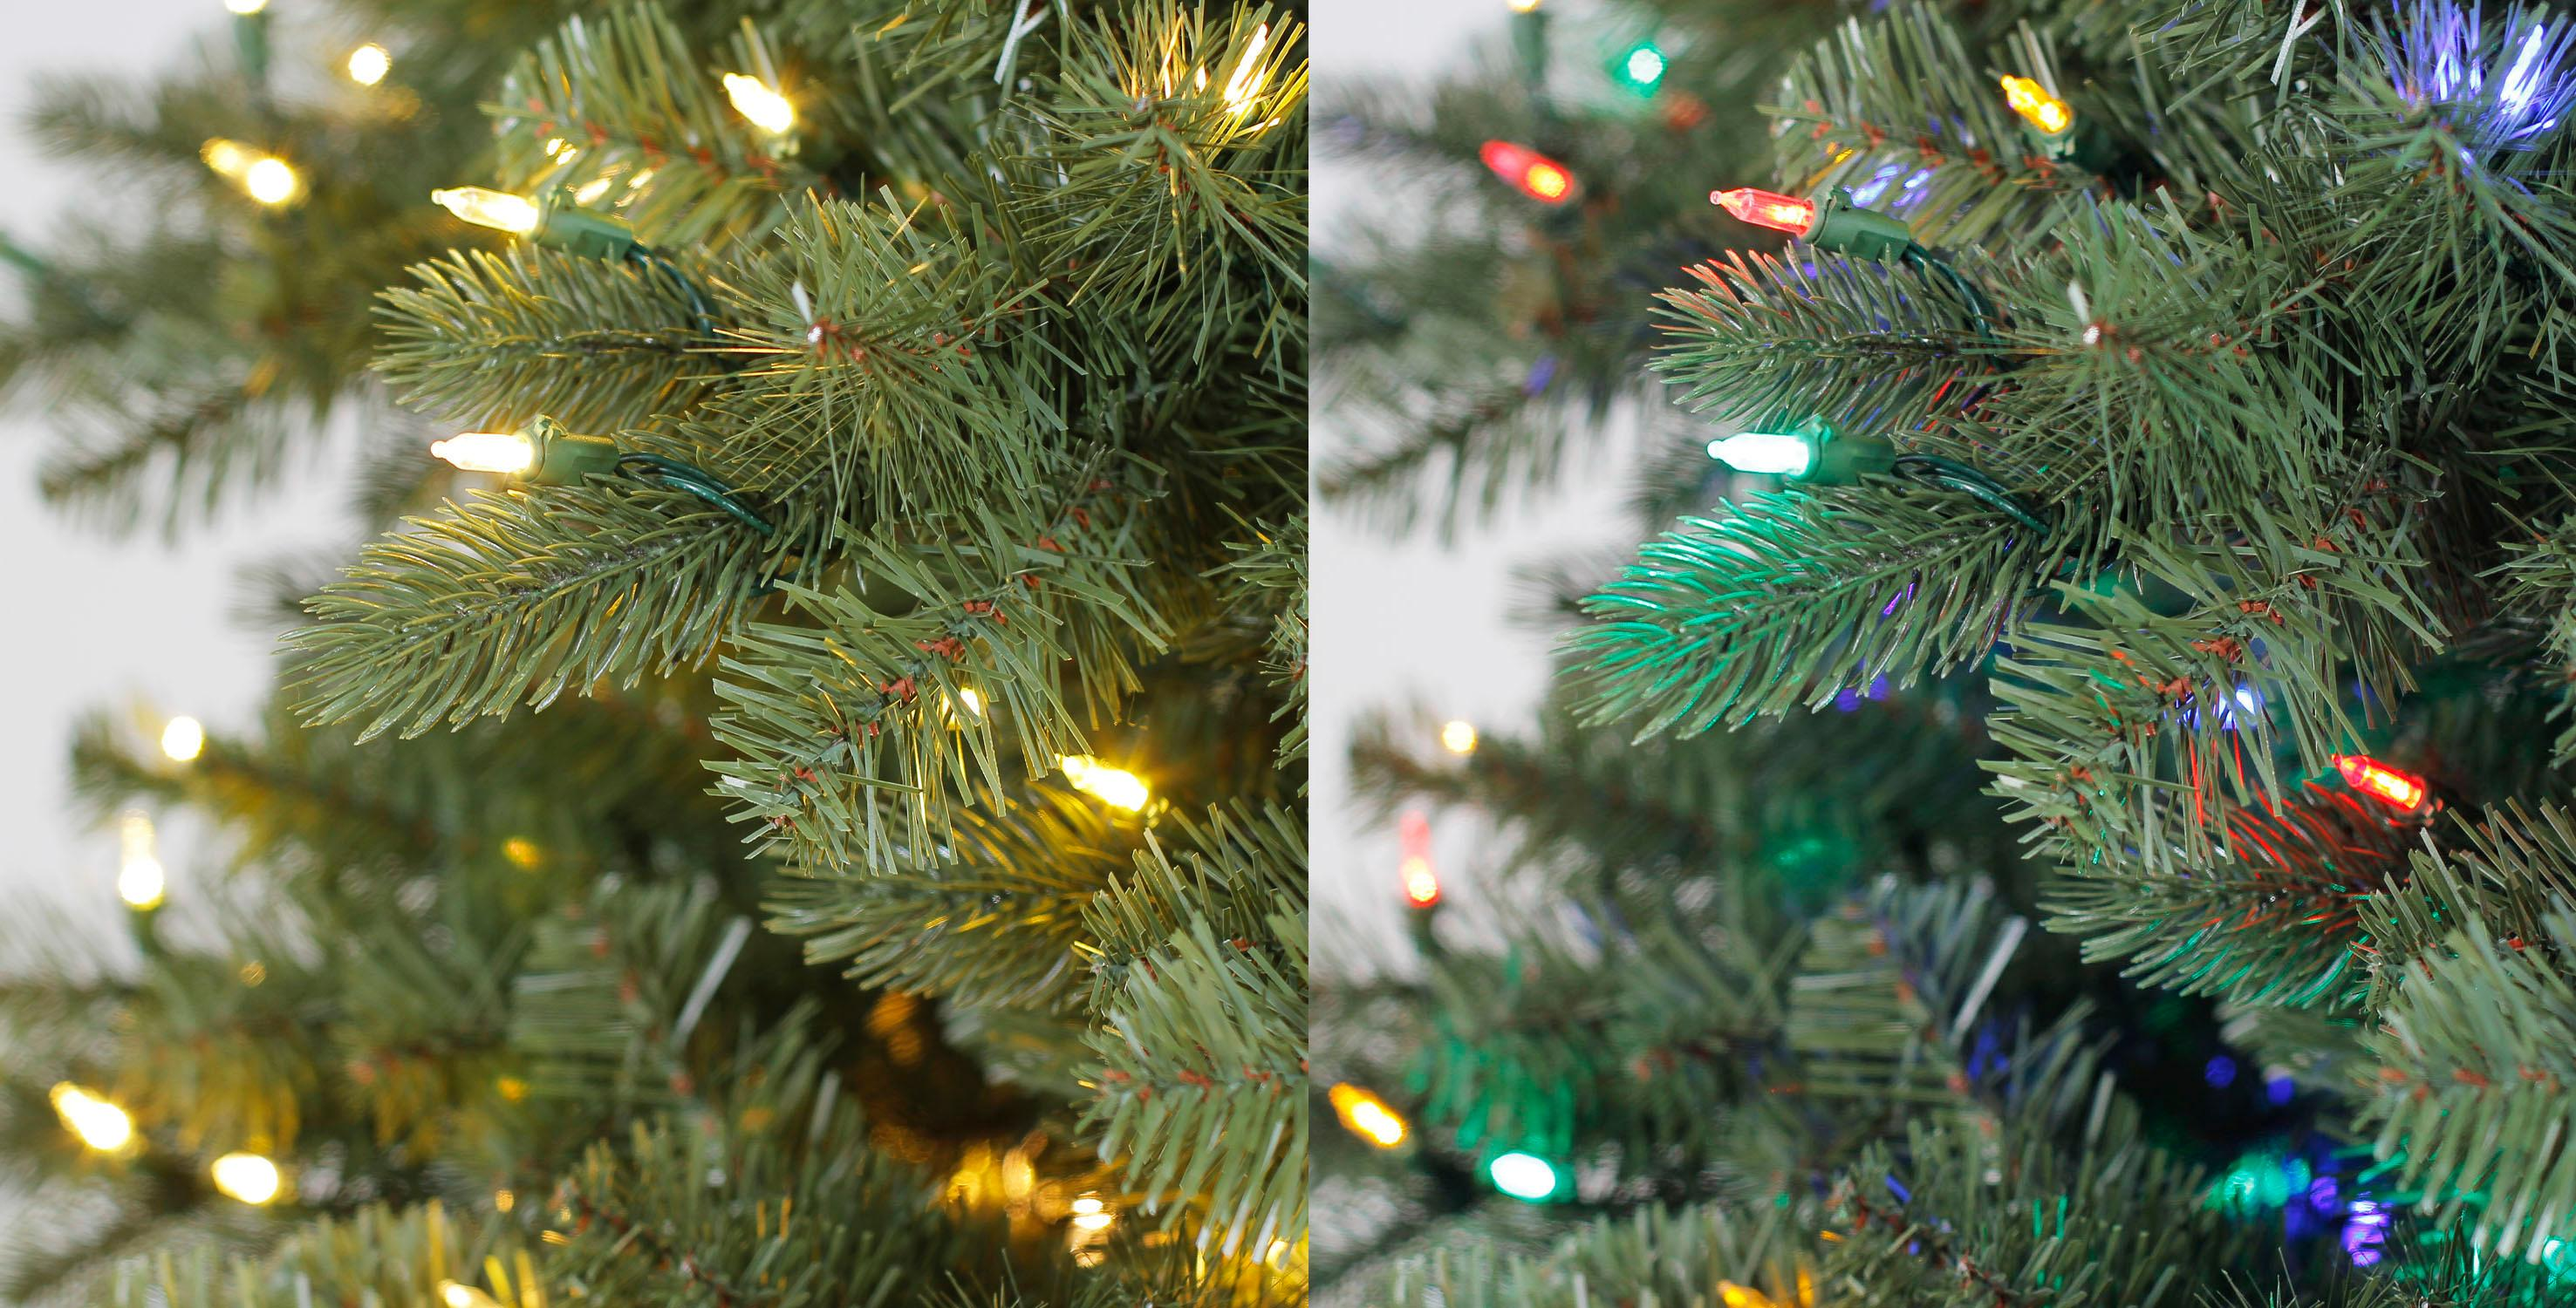 Amazon.com: Evergreen Classics Vermont Spruce 6.5 Ft Color